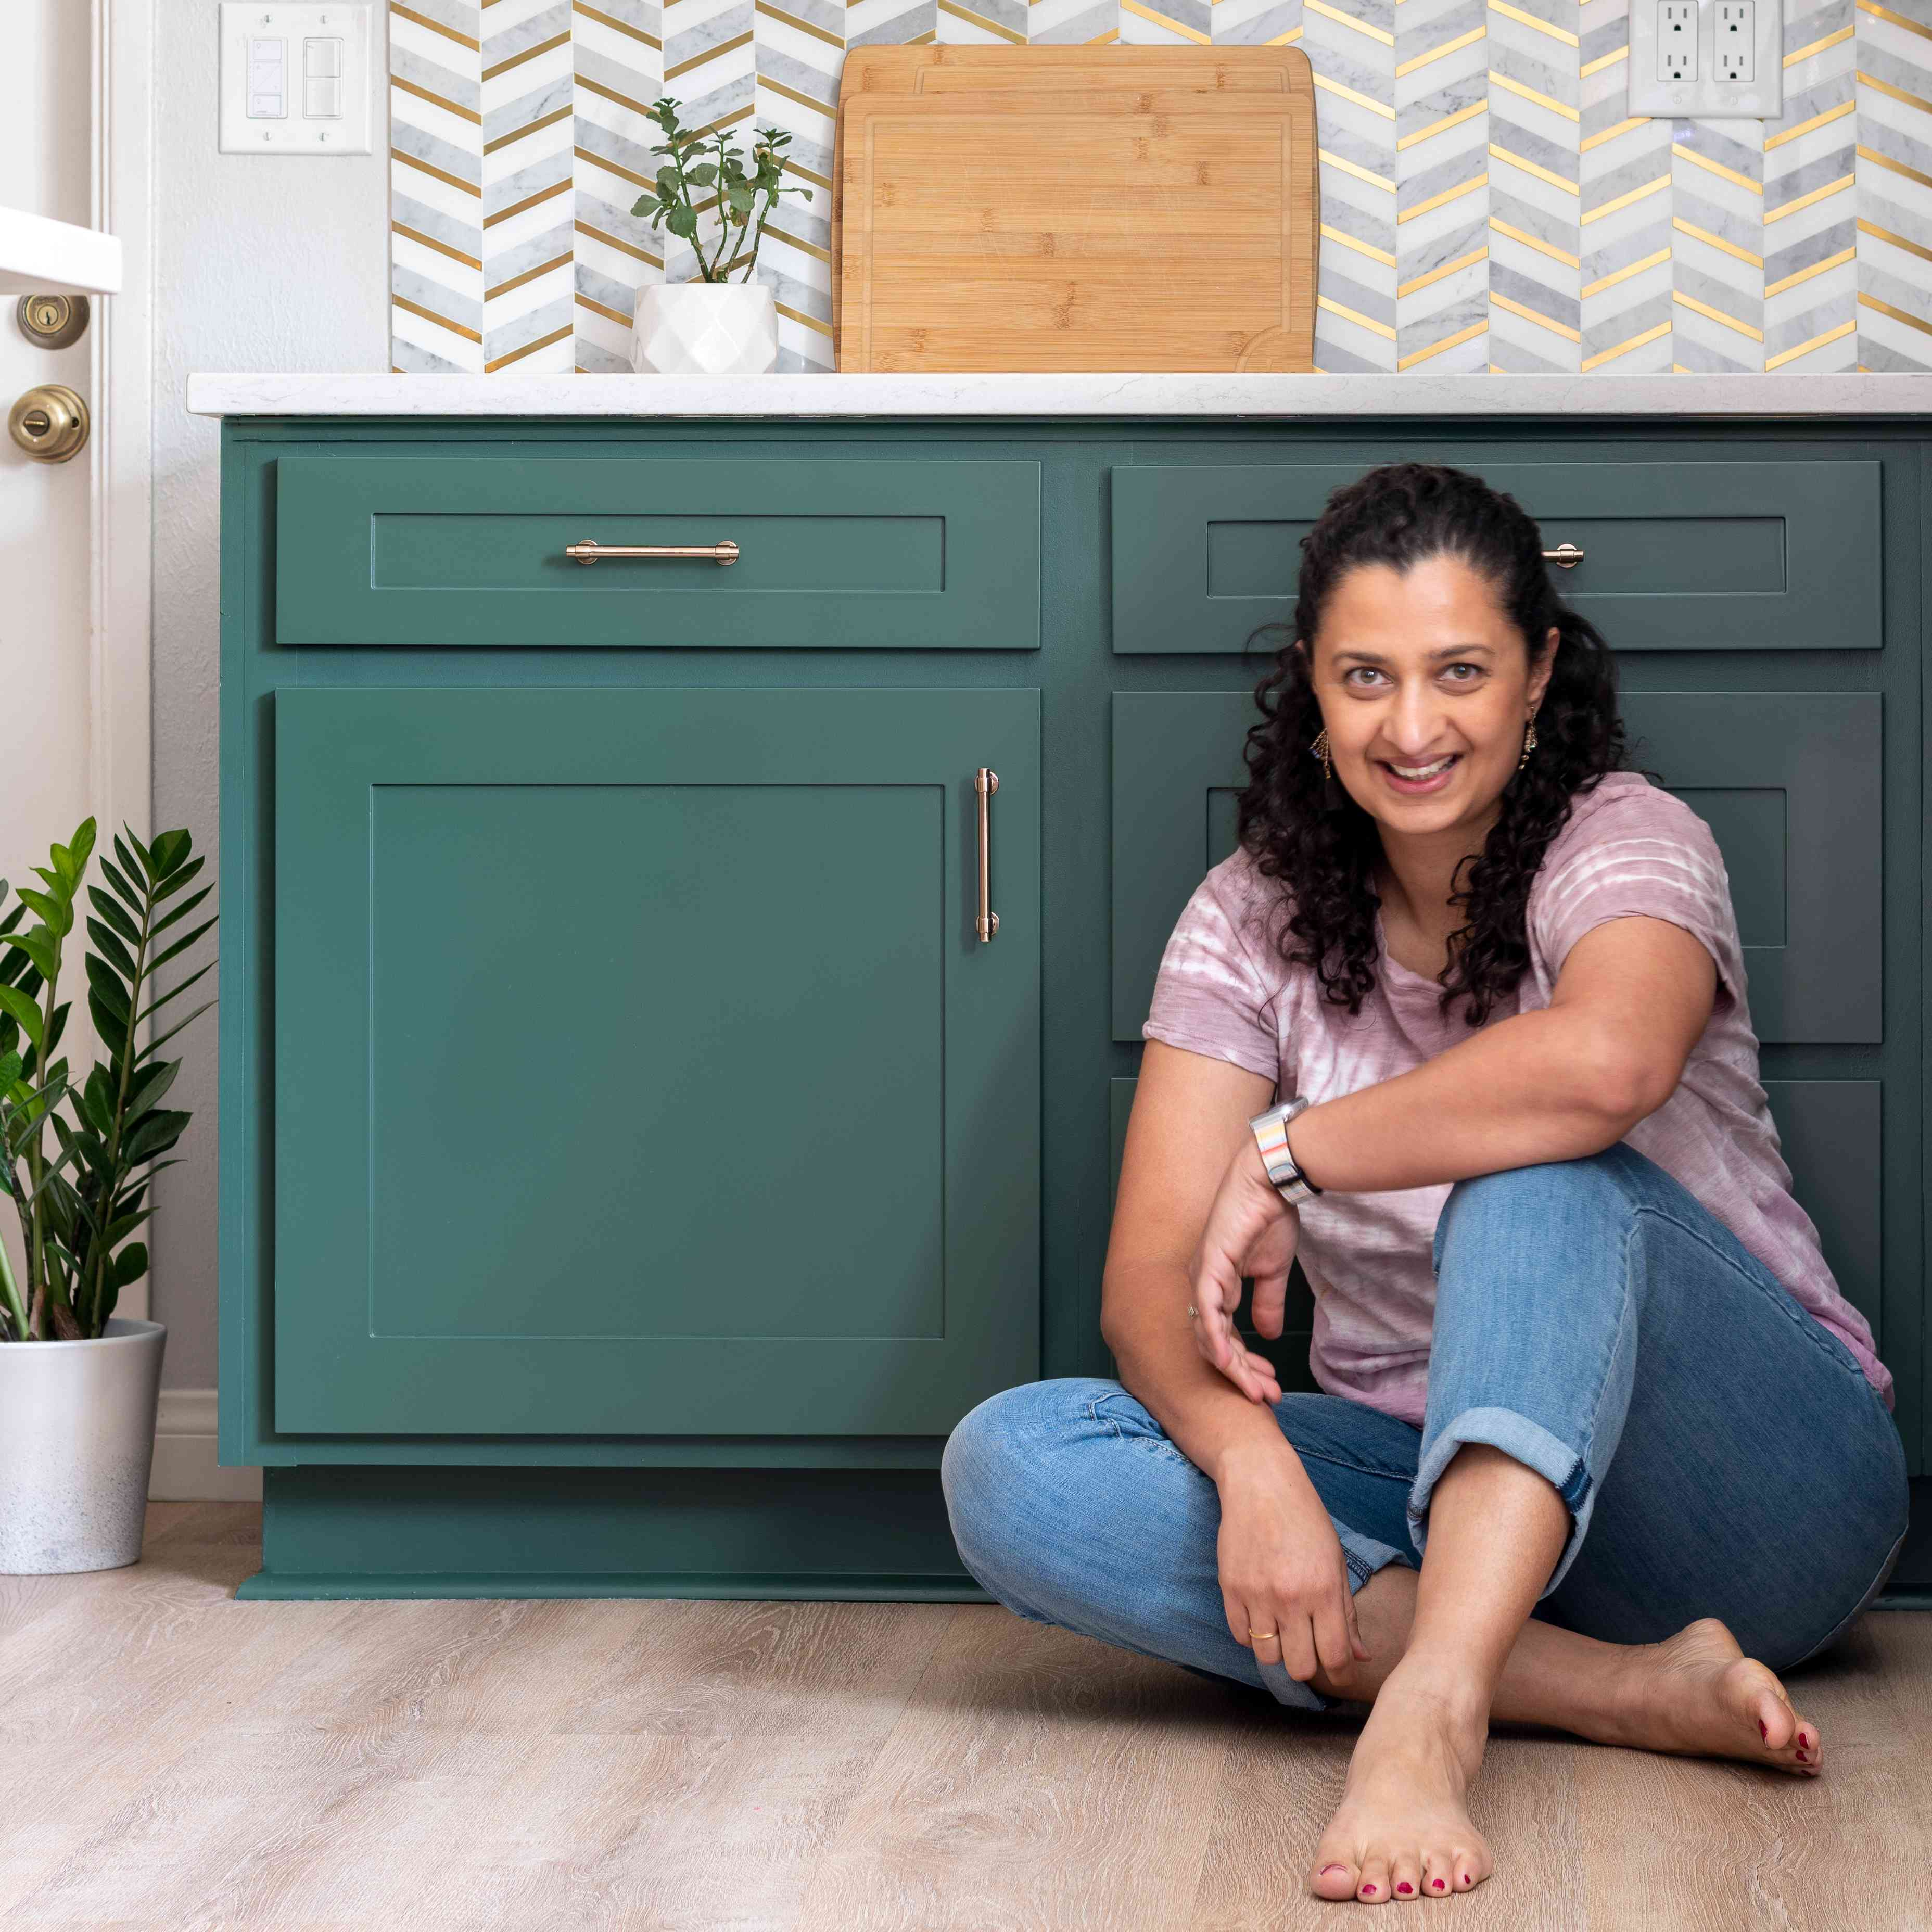 Anika Gandhi sitting in front of a kitchen cabinet